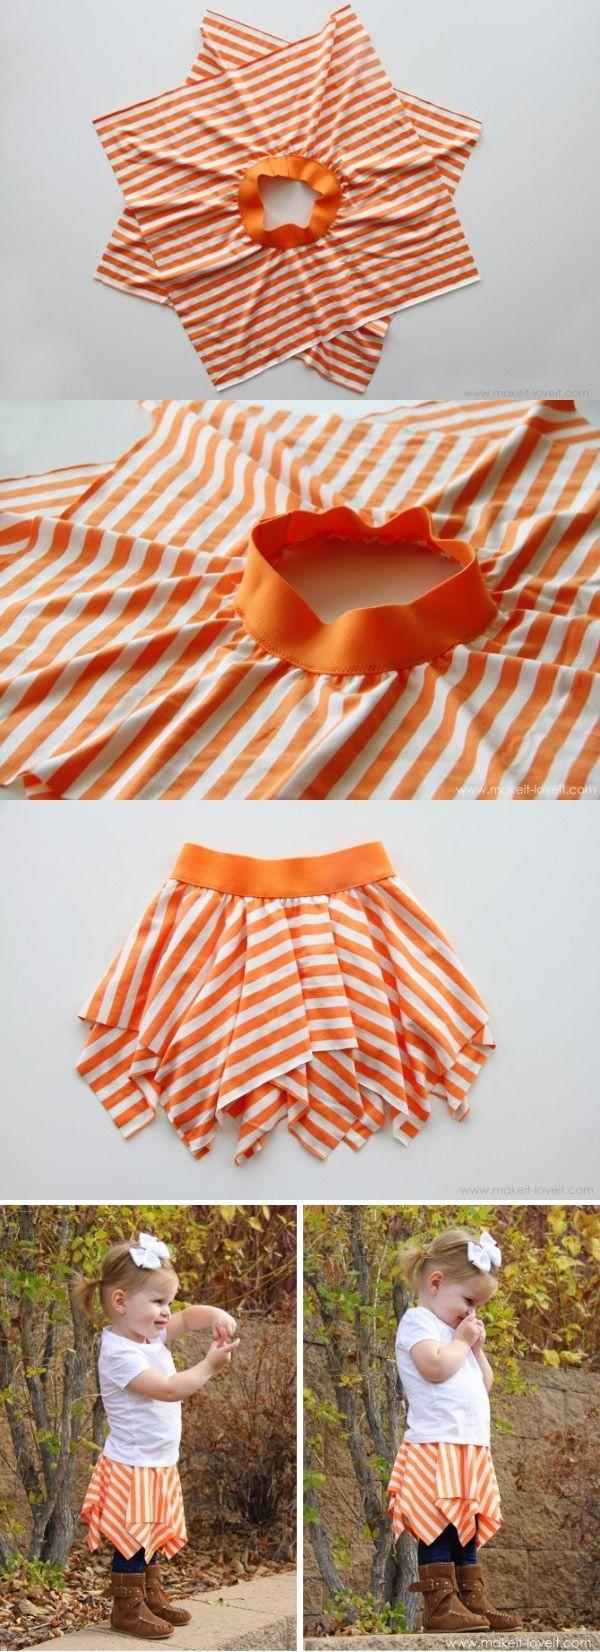 DIY Skirt Tutorial from Make It & Love It